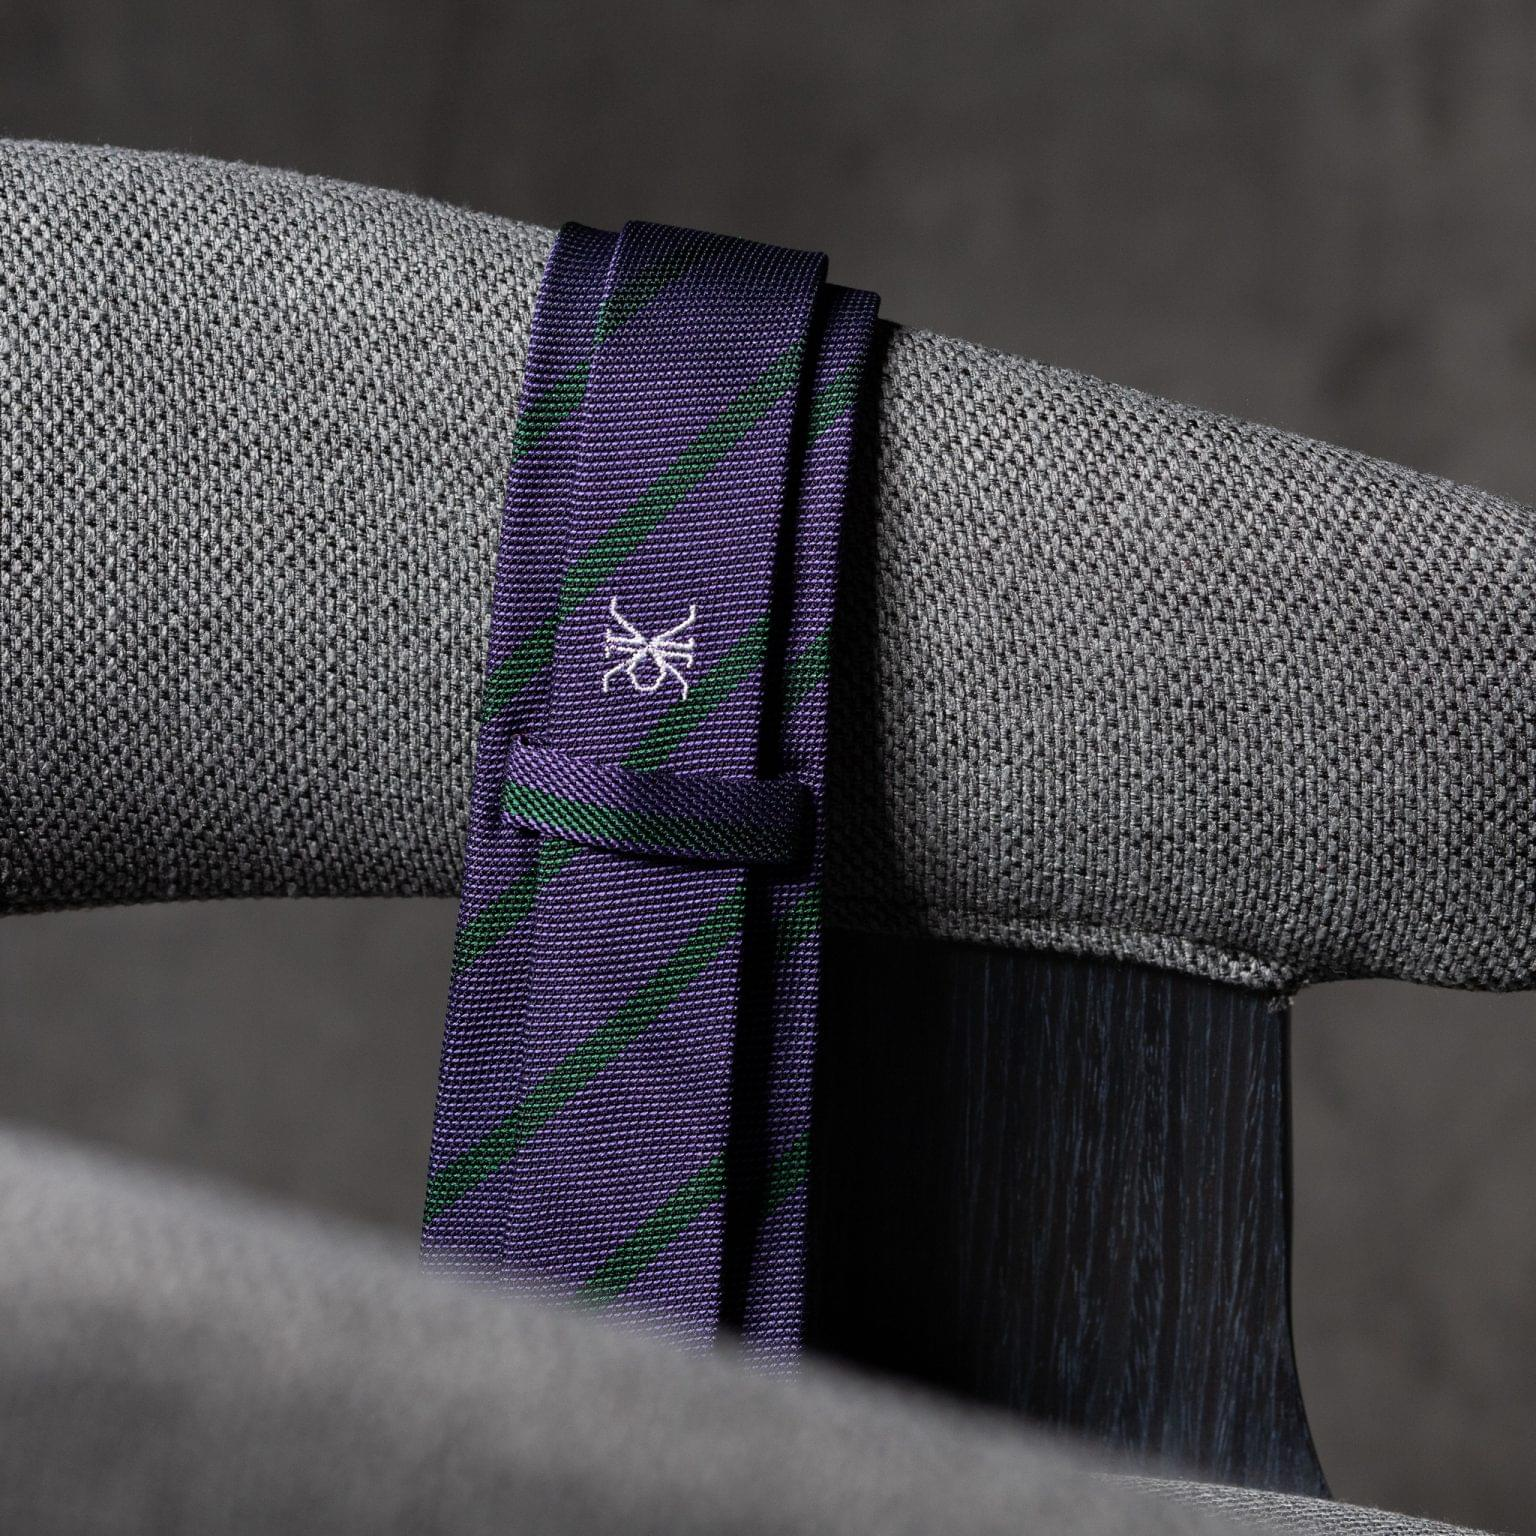 GRENADINE-0531-Tie-Initials-Corbata-Iniciales-The-Seelk-4